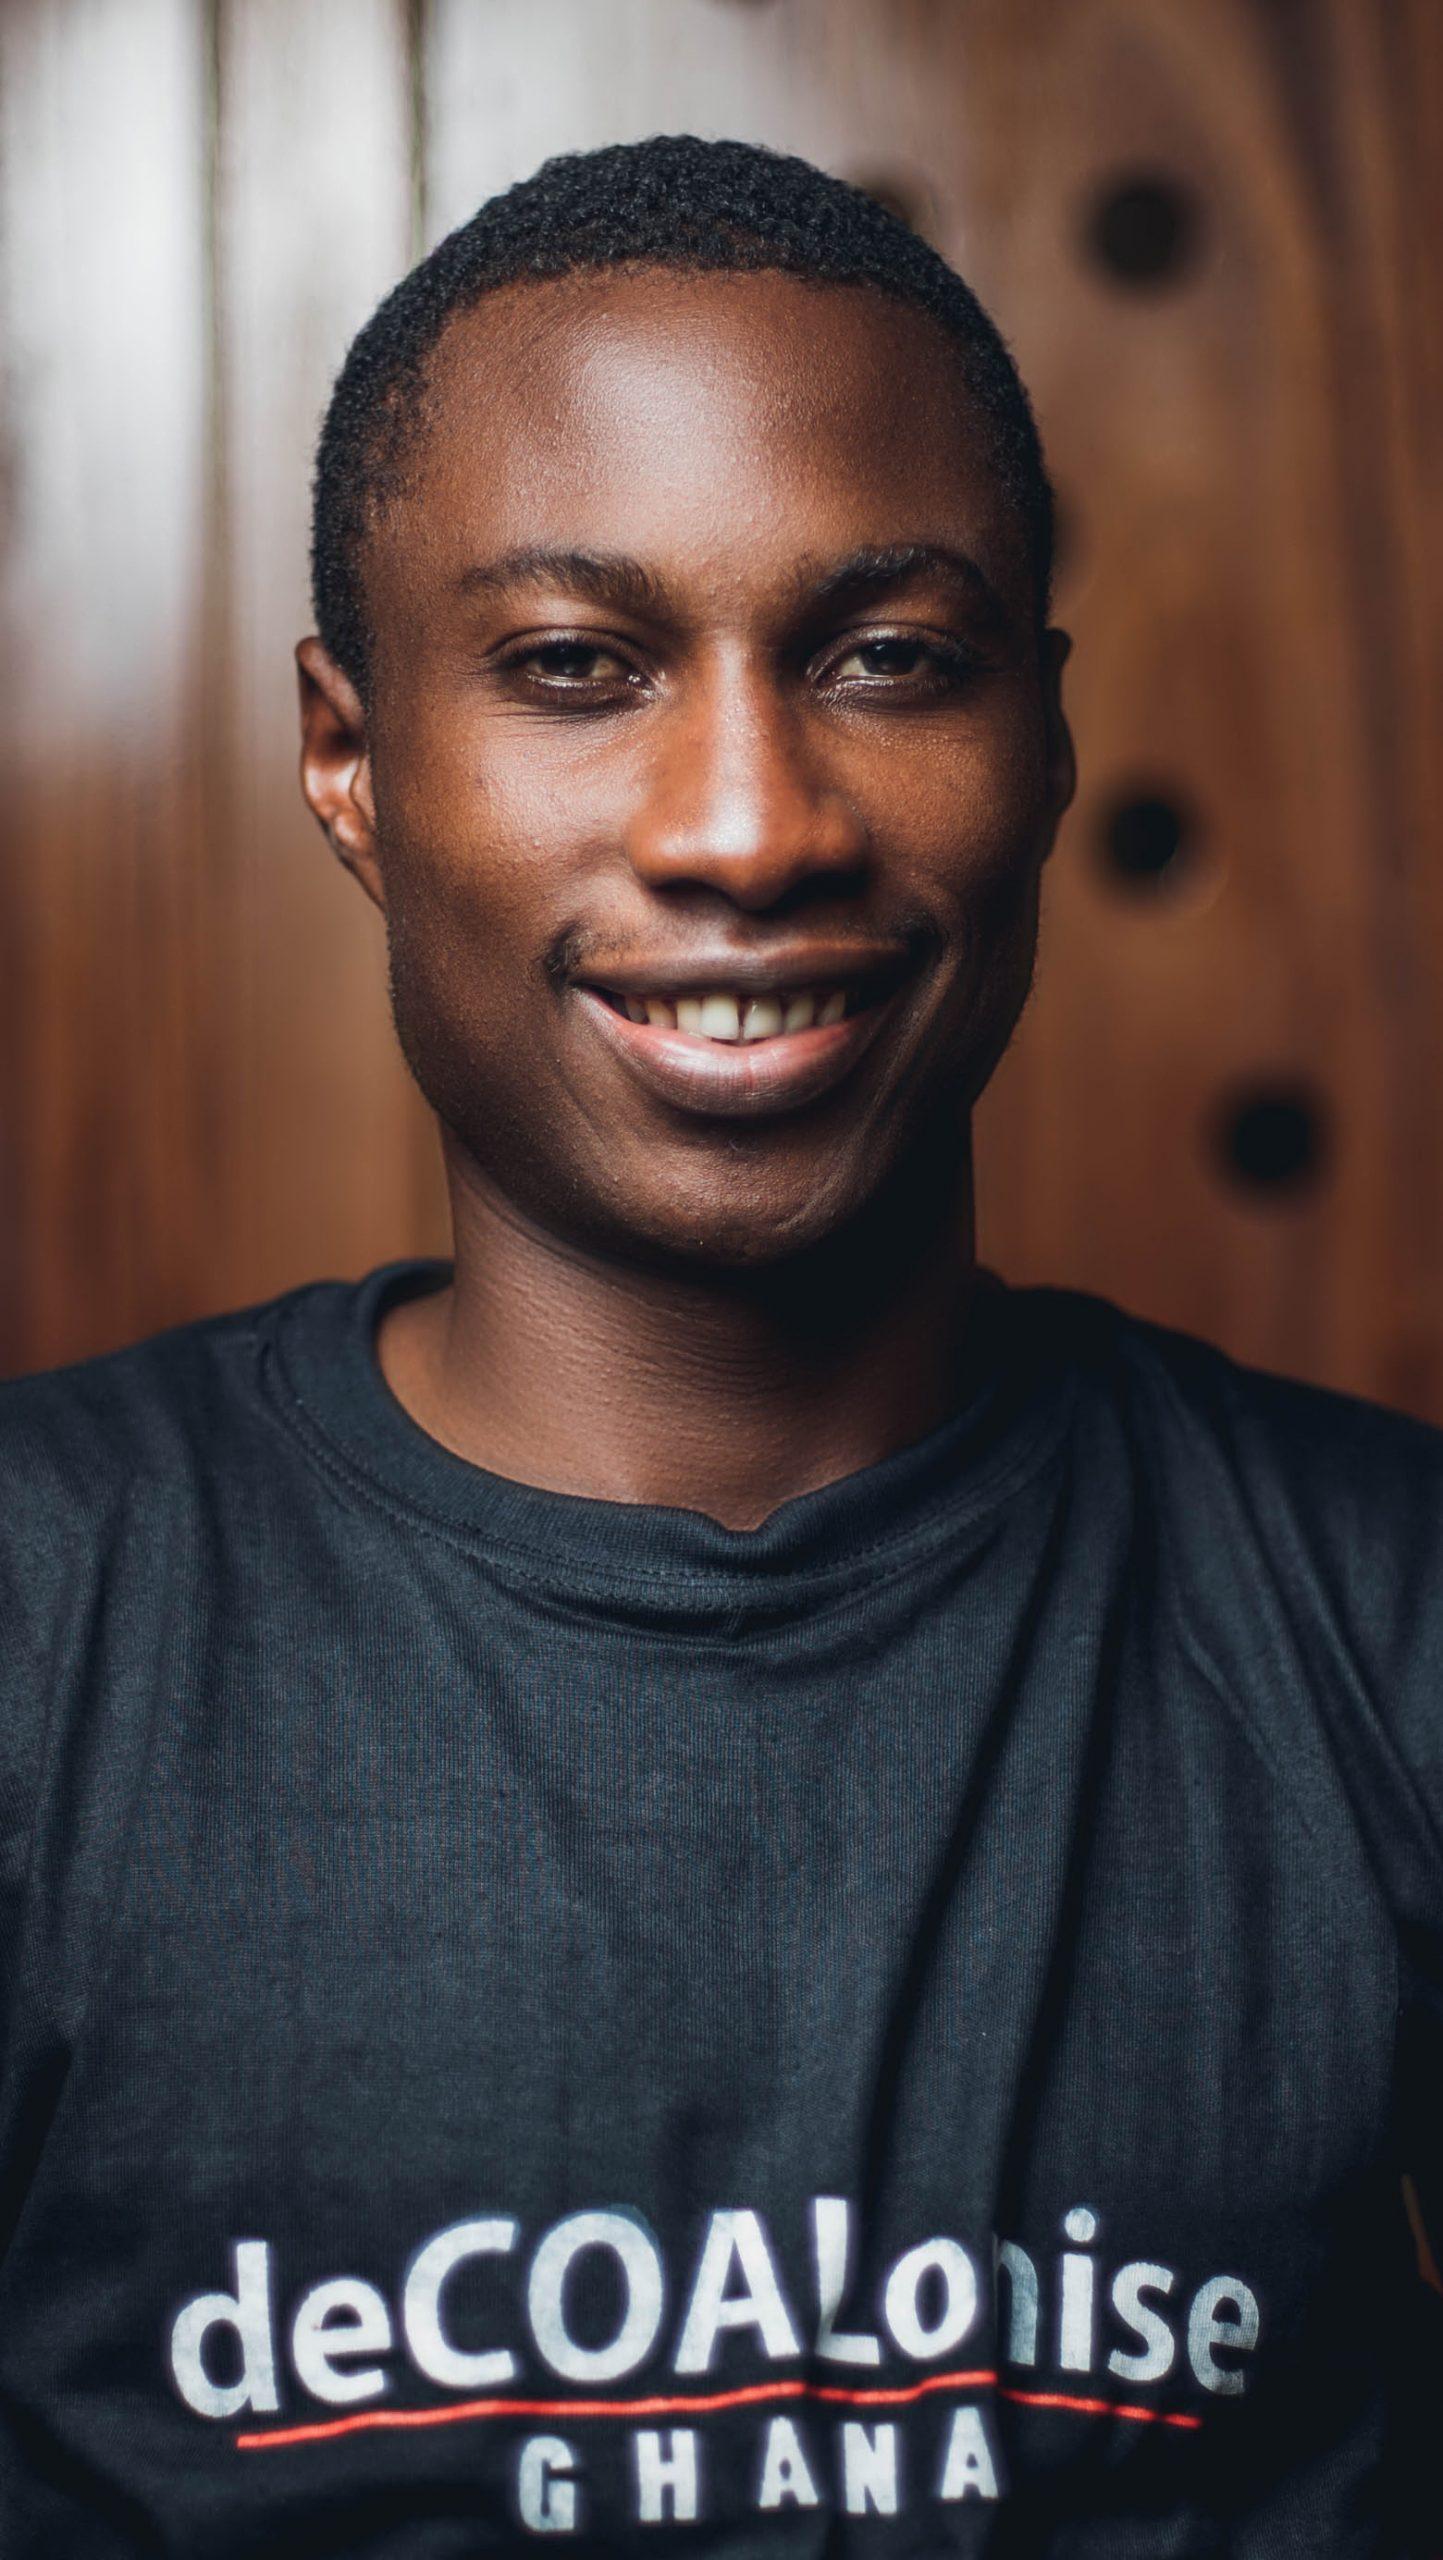 Chibeze Ezekiel from Ghana wins 2020 Goldman Environmental Prize